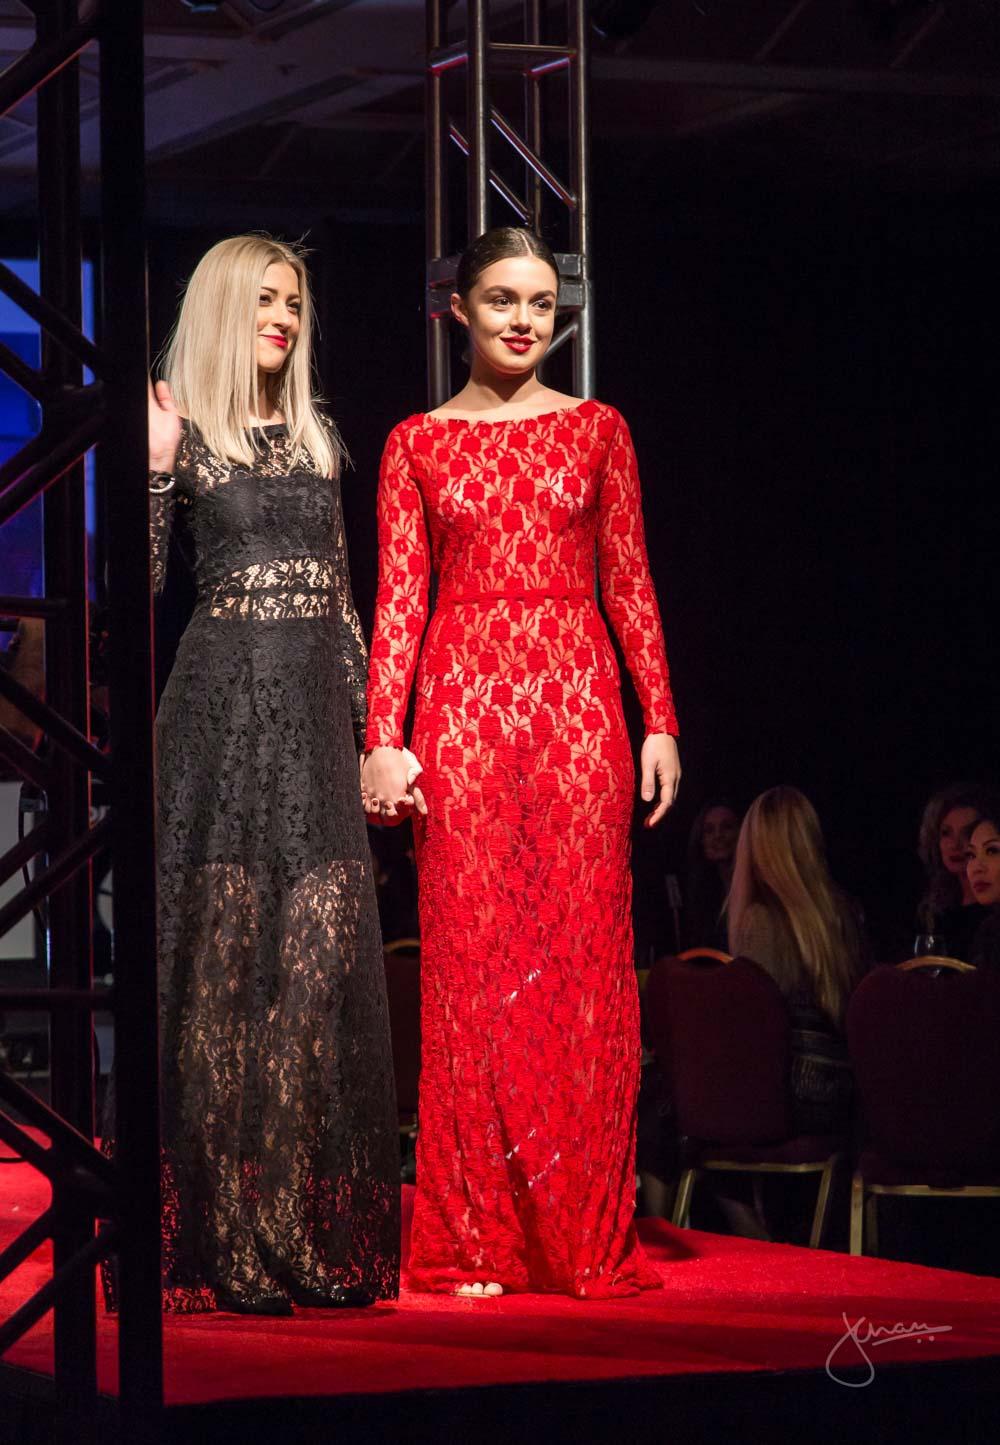 Little Black Dress Gala Fashion Show